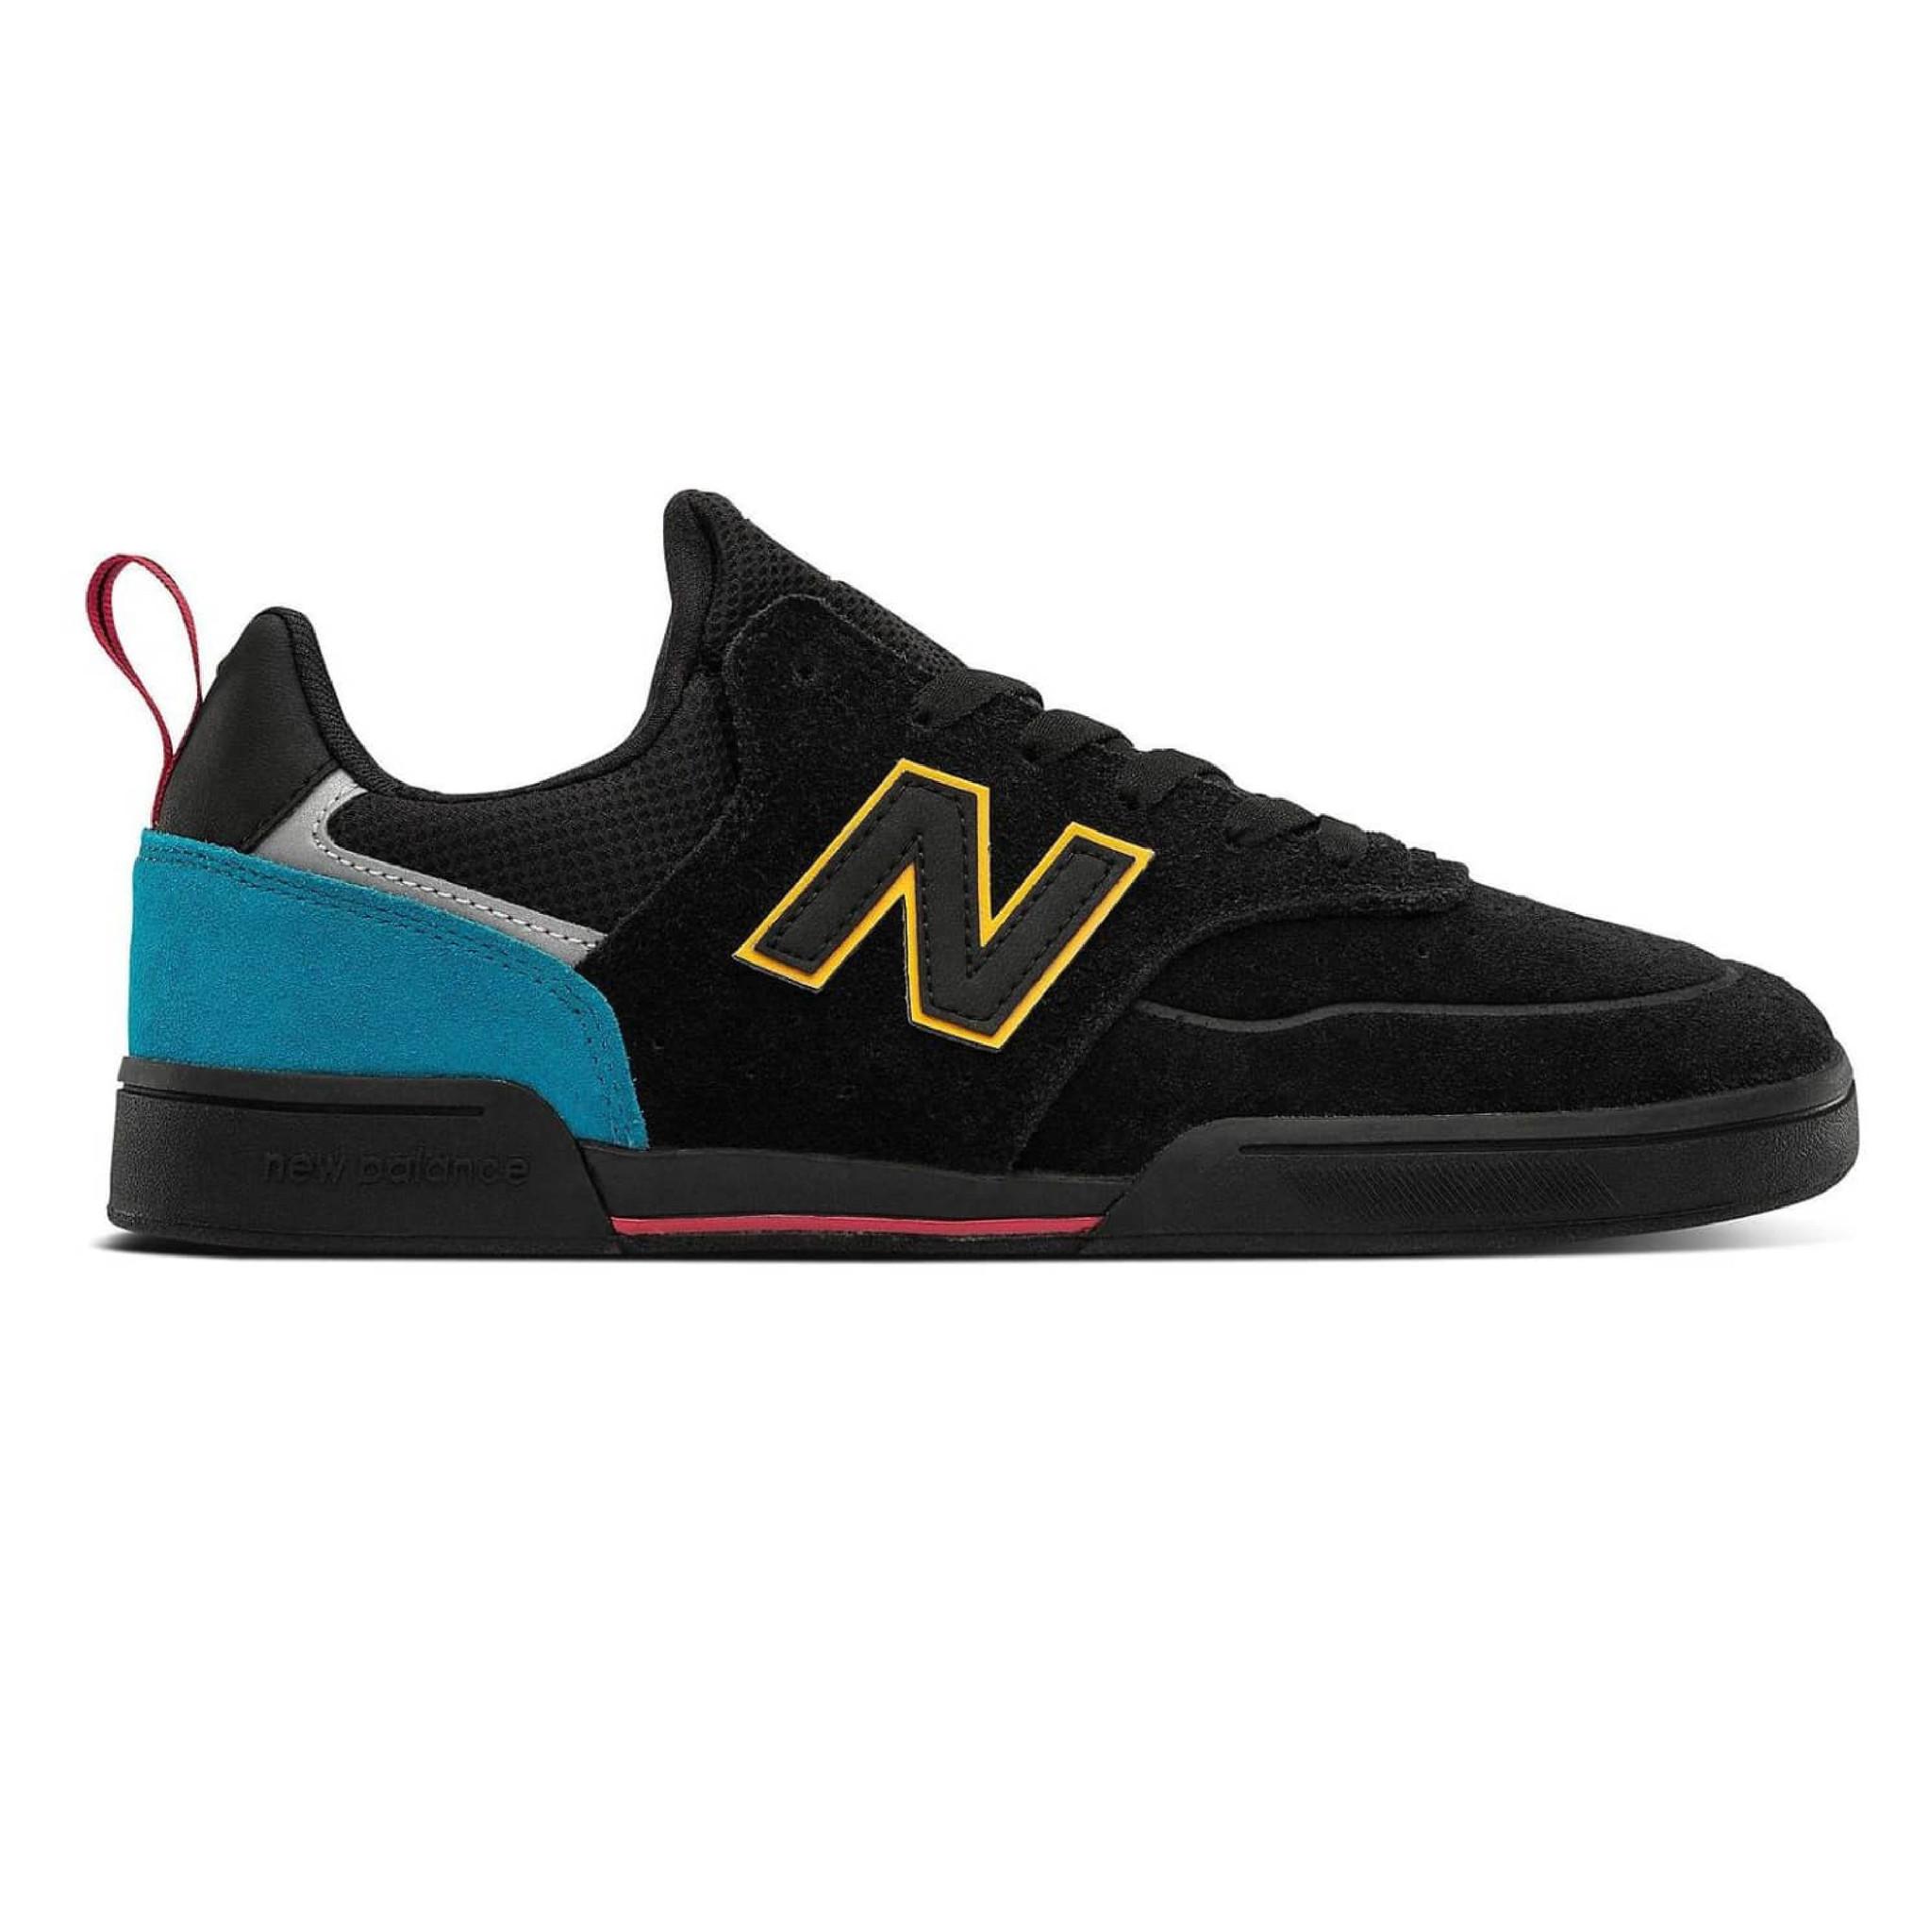 NB NUMERIC NB NUMERIC 288 SPORT BLACK /YELLOW/BLUE